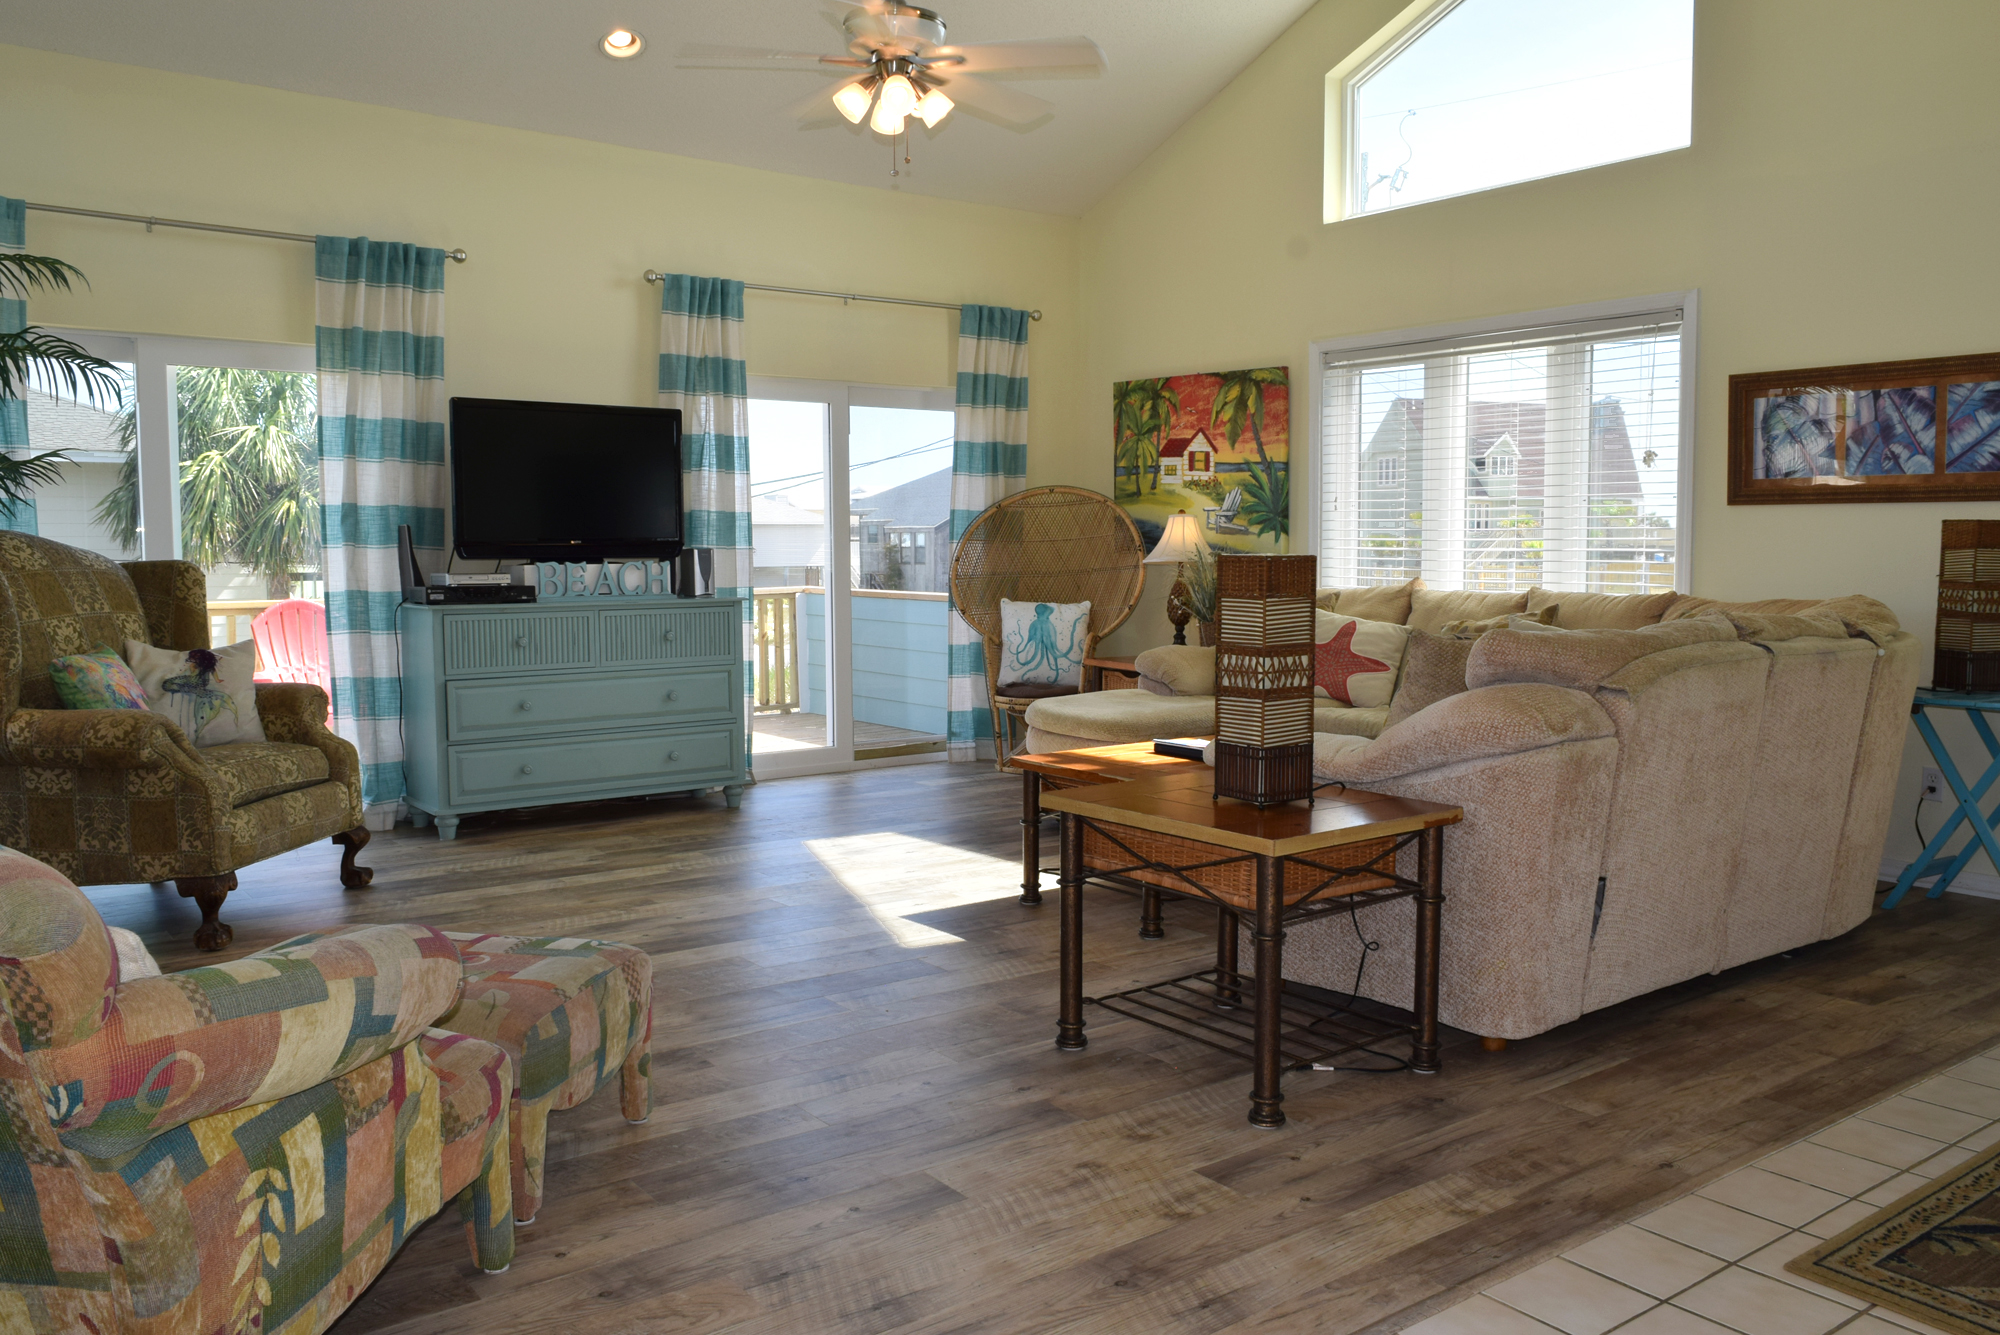 Maldonado 1103 House/Cottage rental in Pensacola Beach House Rentals in Pensacola Beach Florida - #4